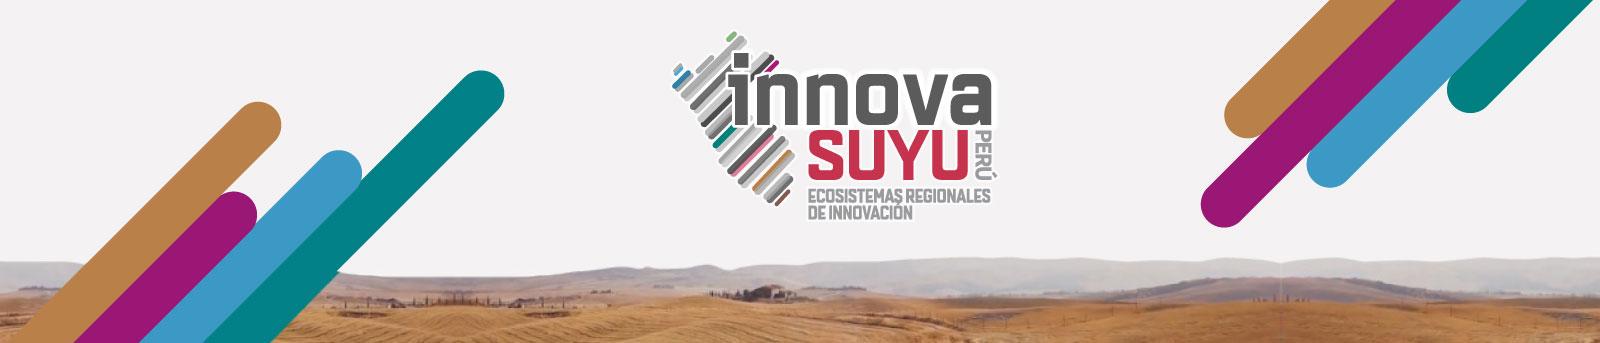 Innovasuyu